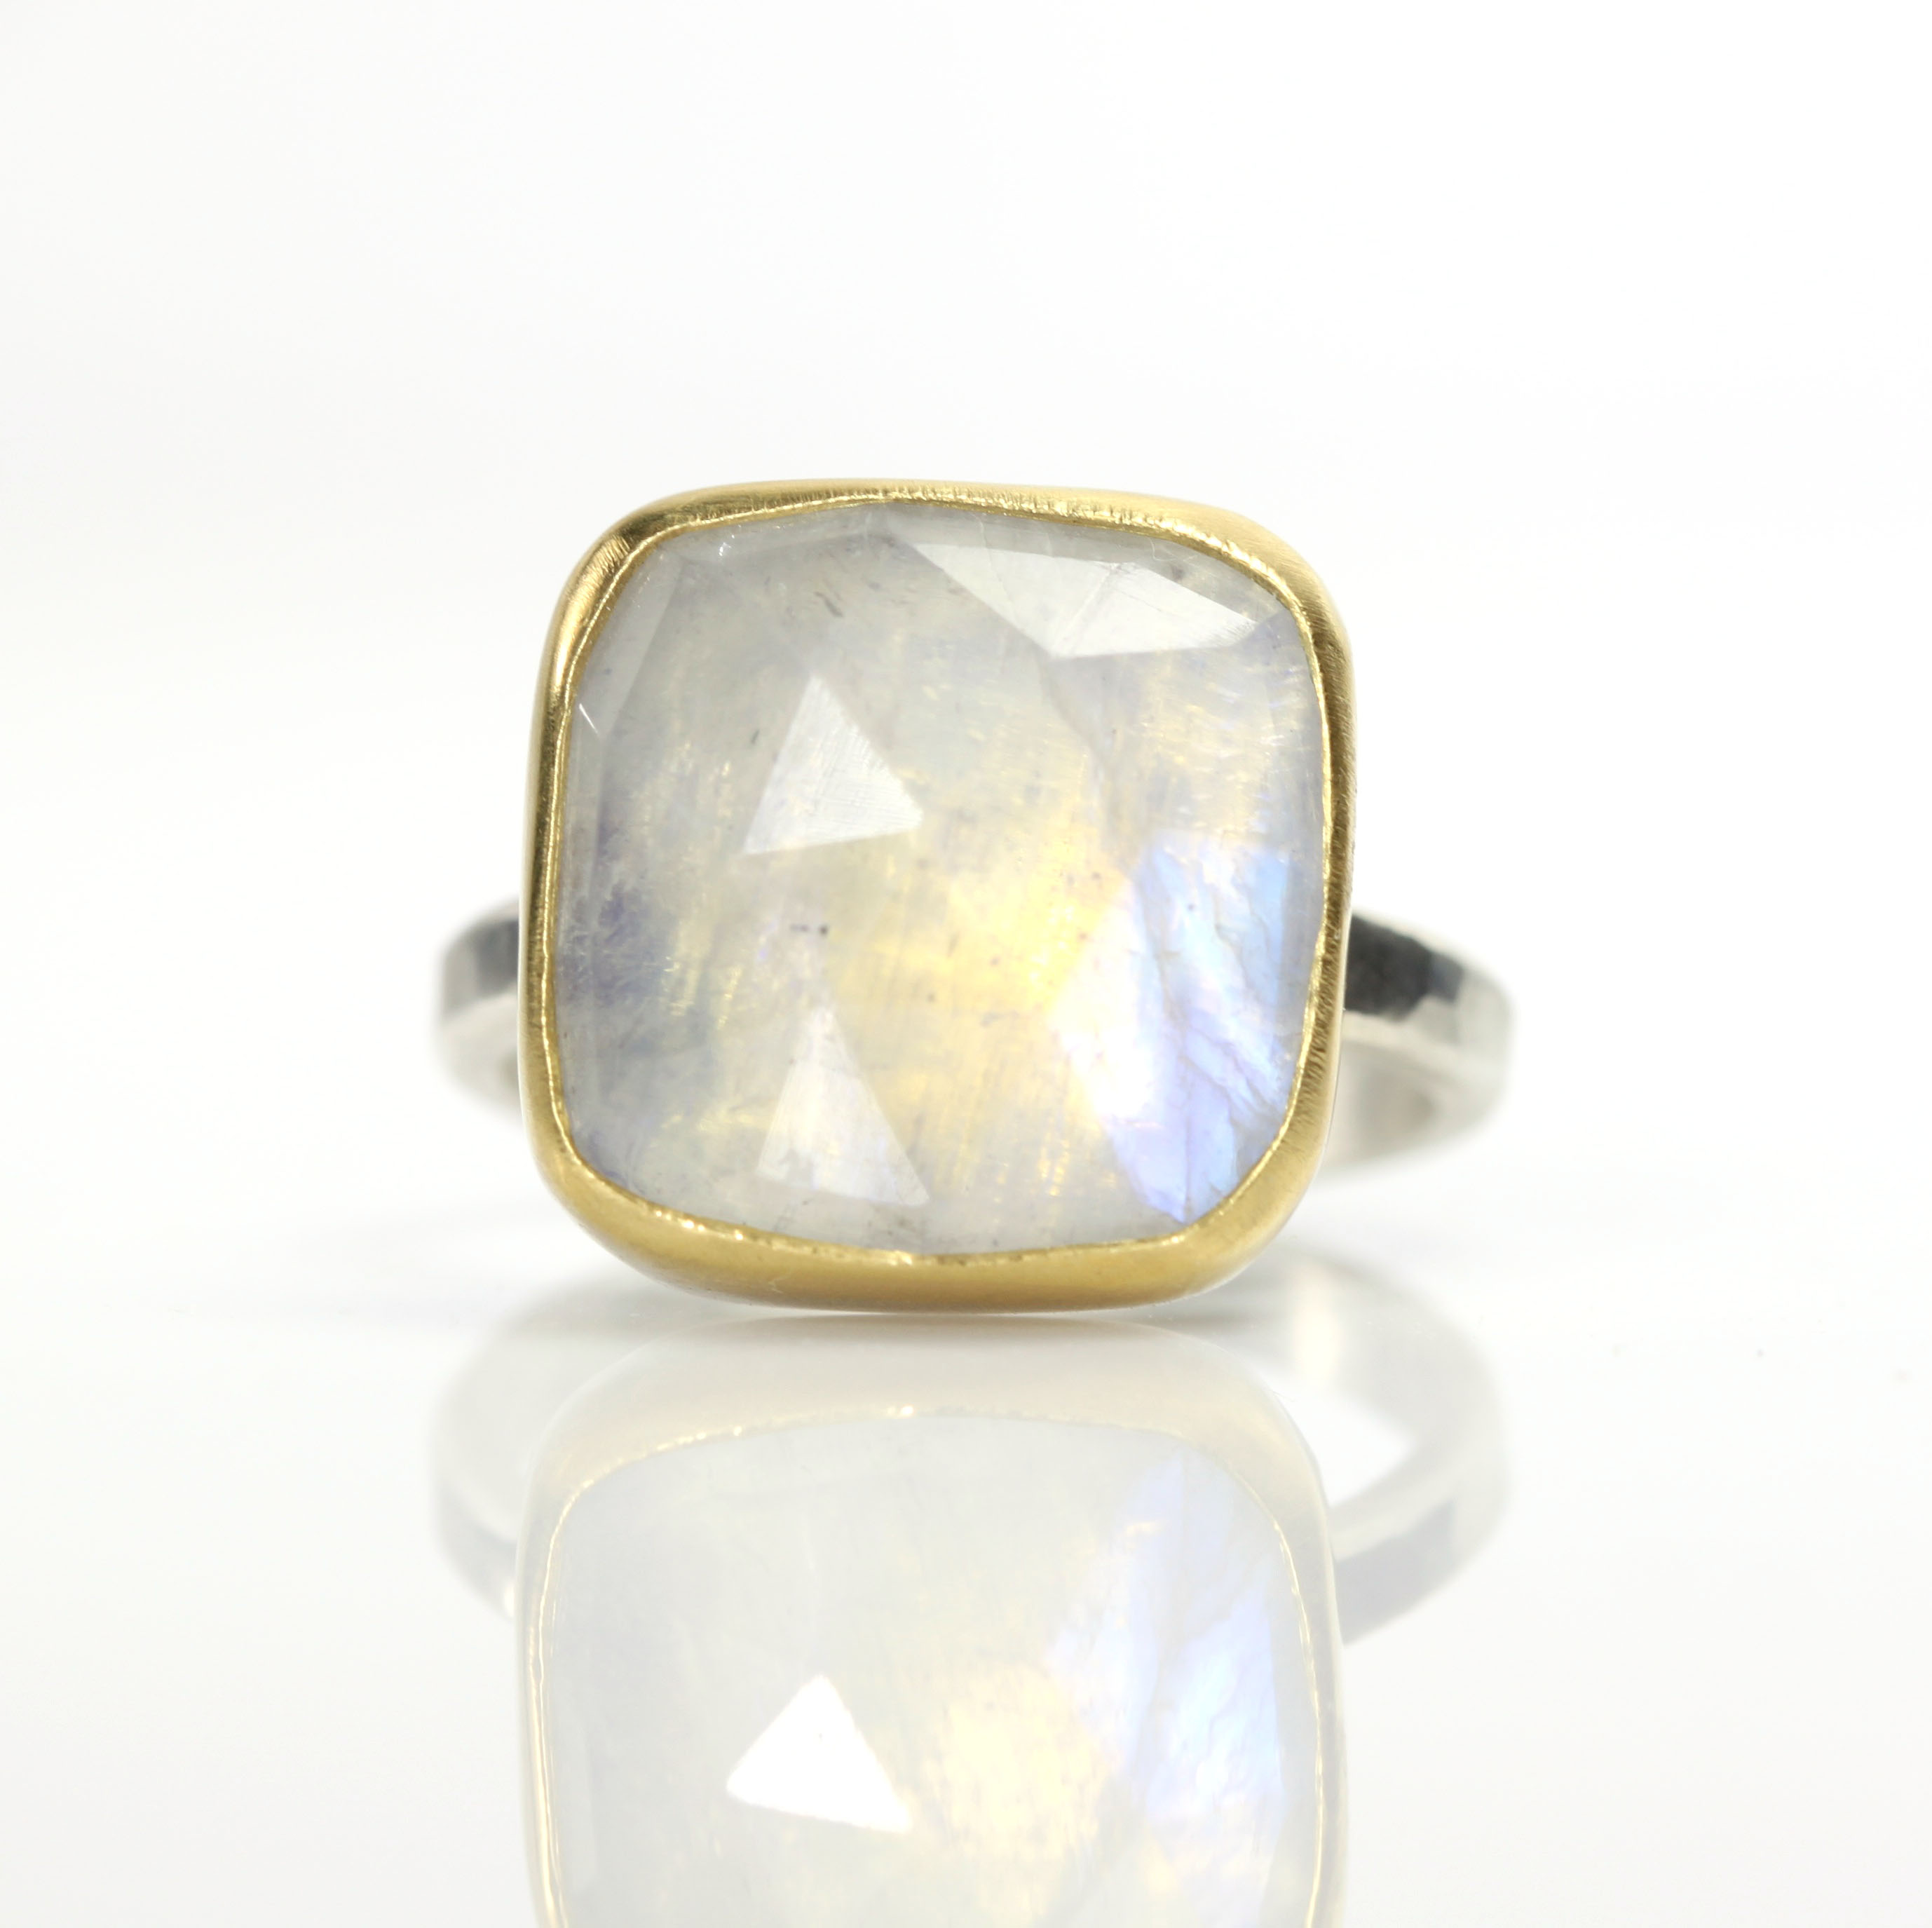 Square Rose Cut Rainbow Moonstone Ring